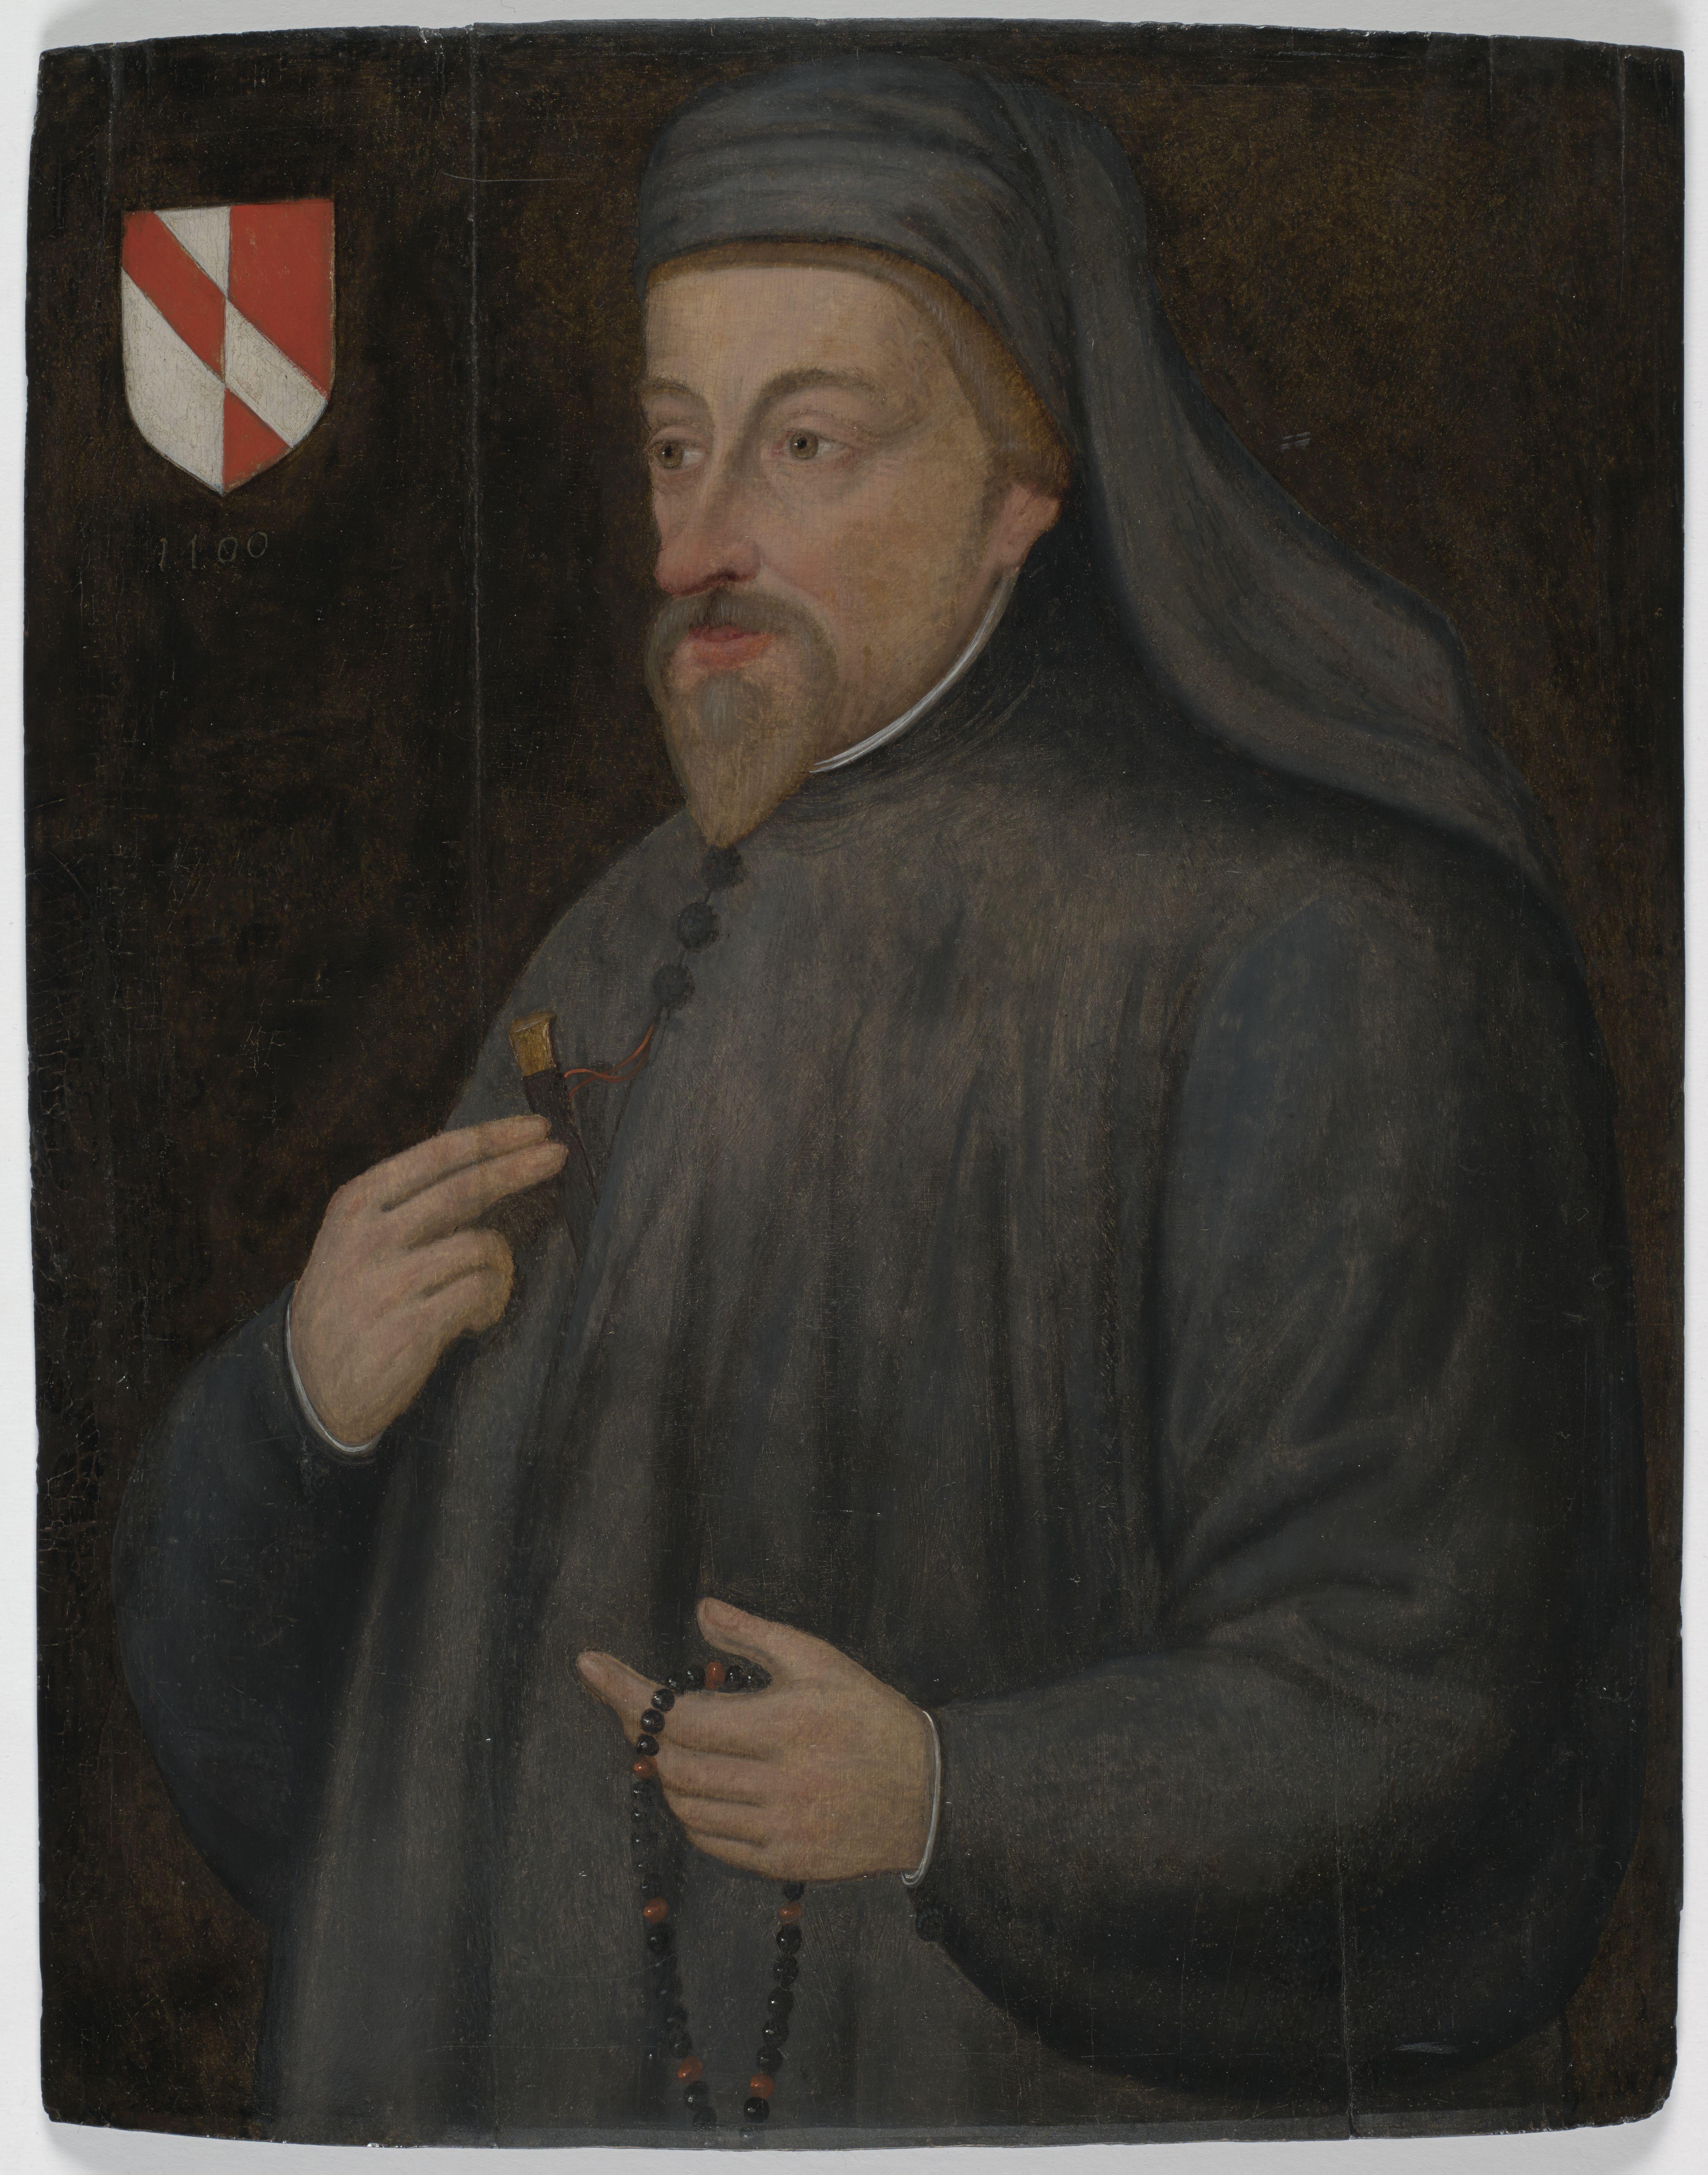 Geoffrey Chaucer  17th Geoffrey Chaucer